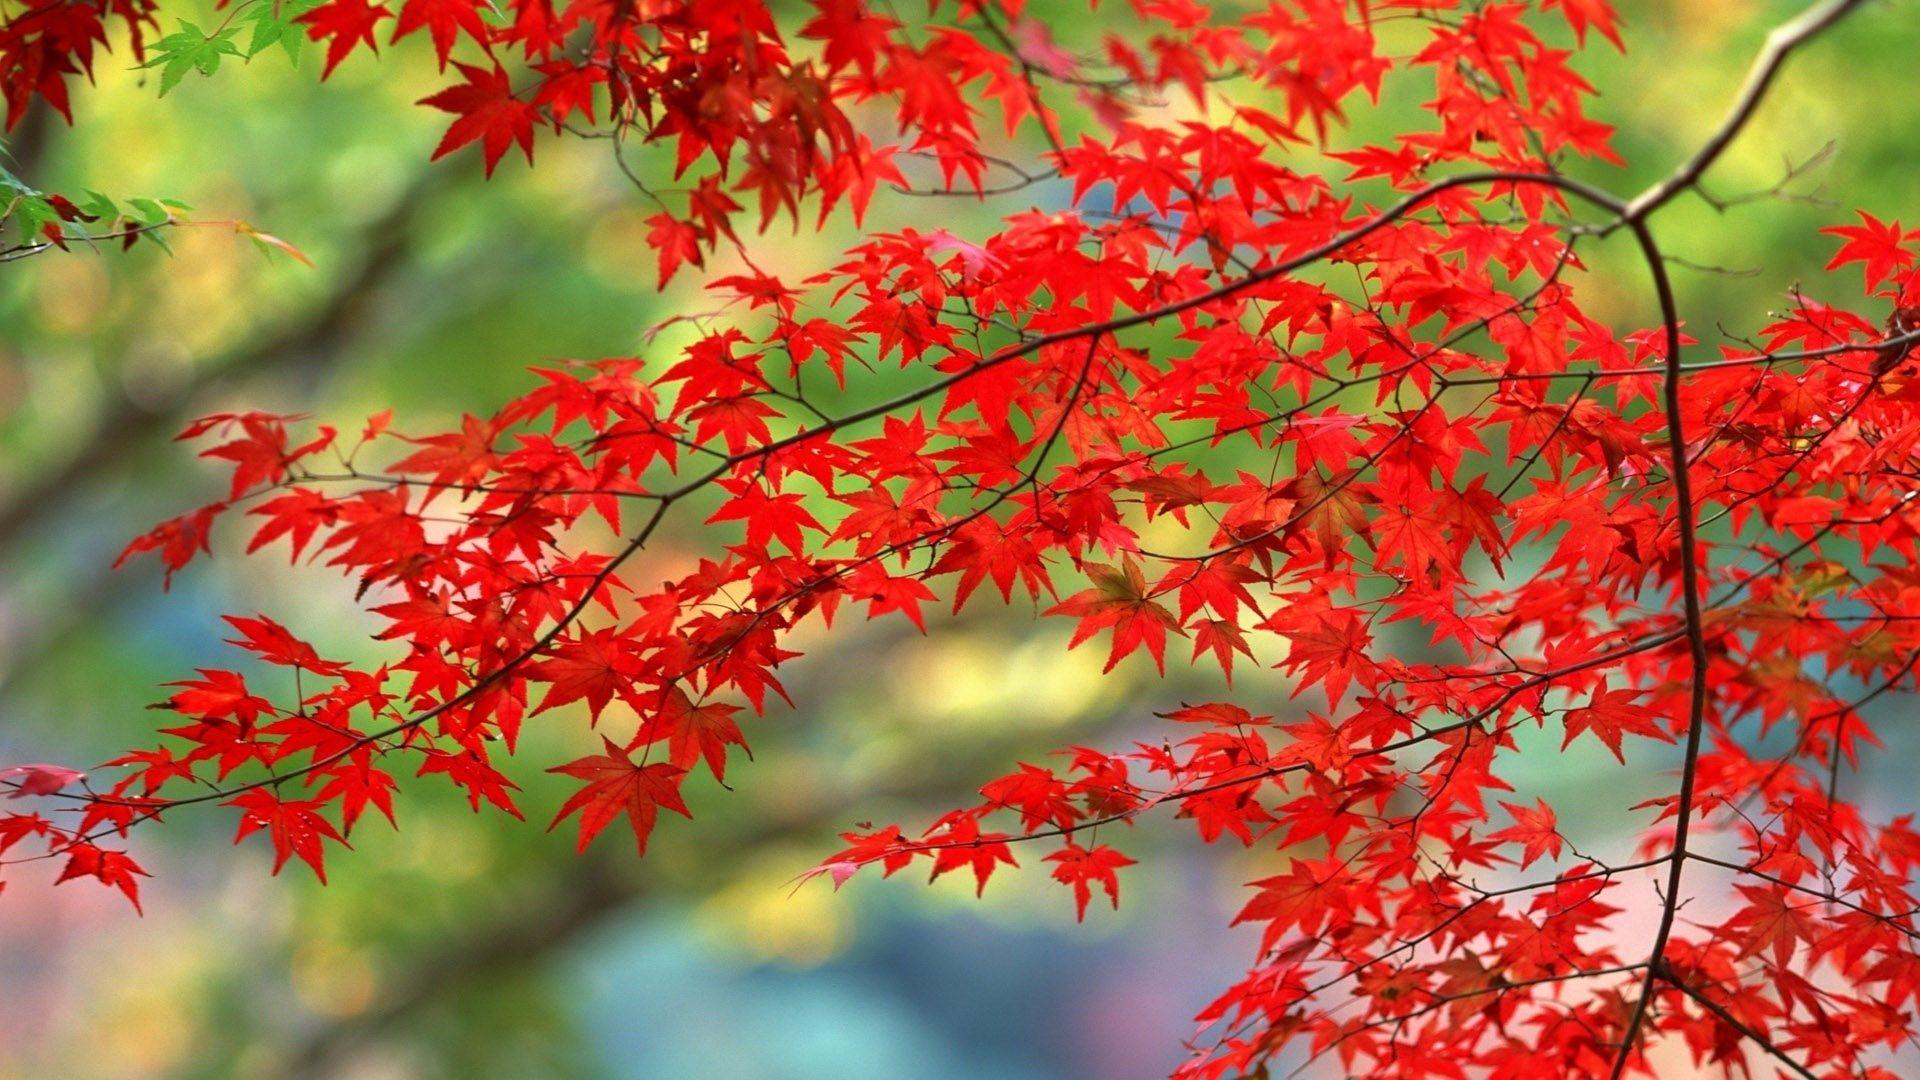 autumn hd wallpapers 1080p high quality ololoshenka